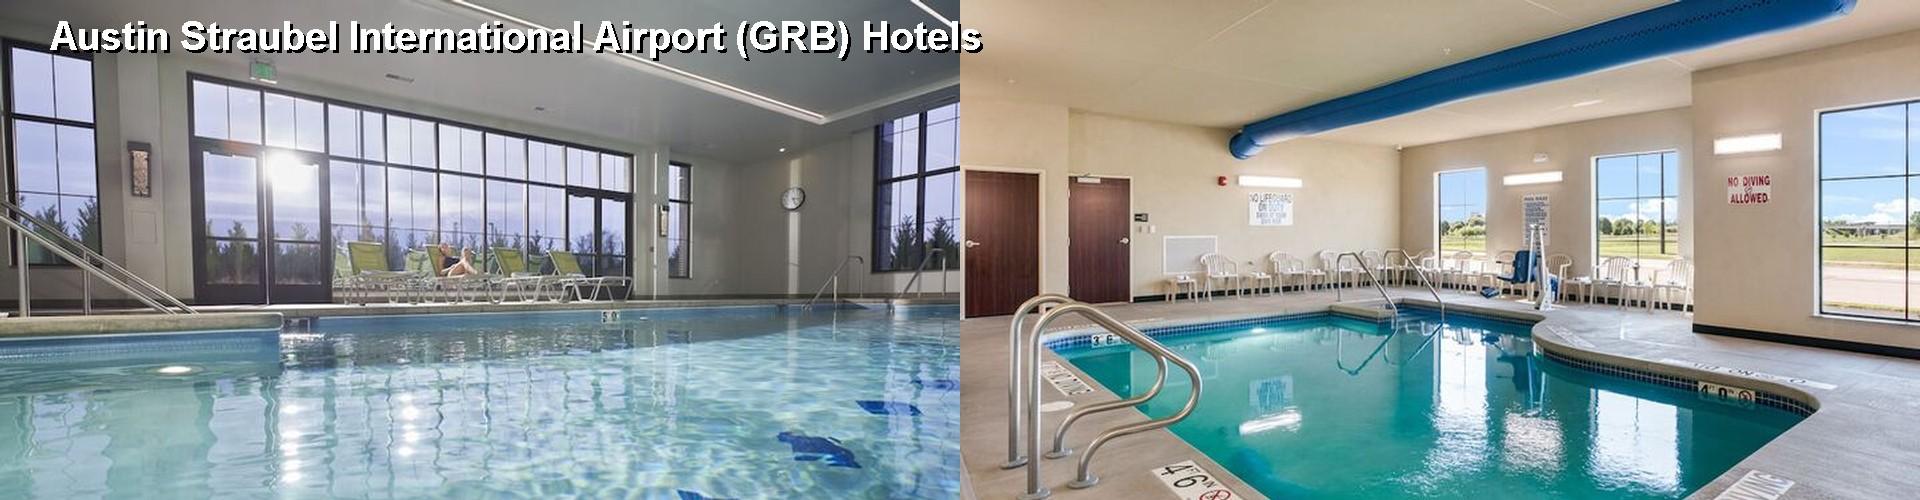 Hotels Near Austin Straubel International Airport